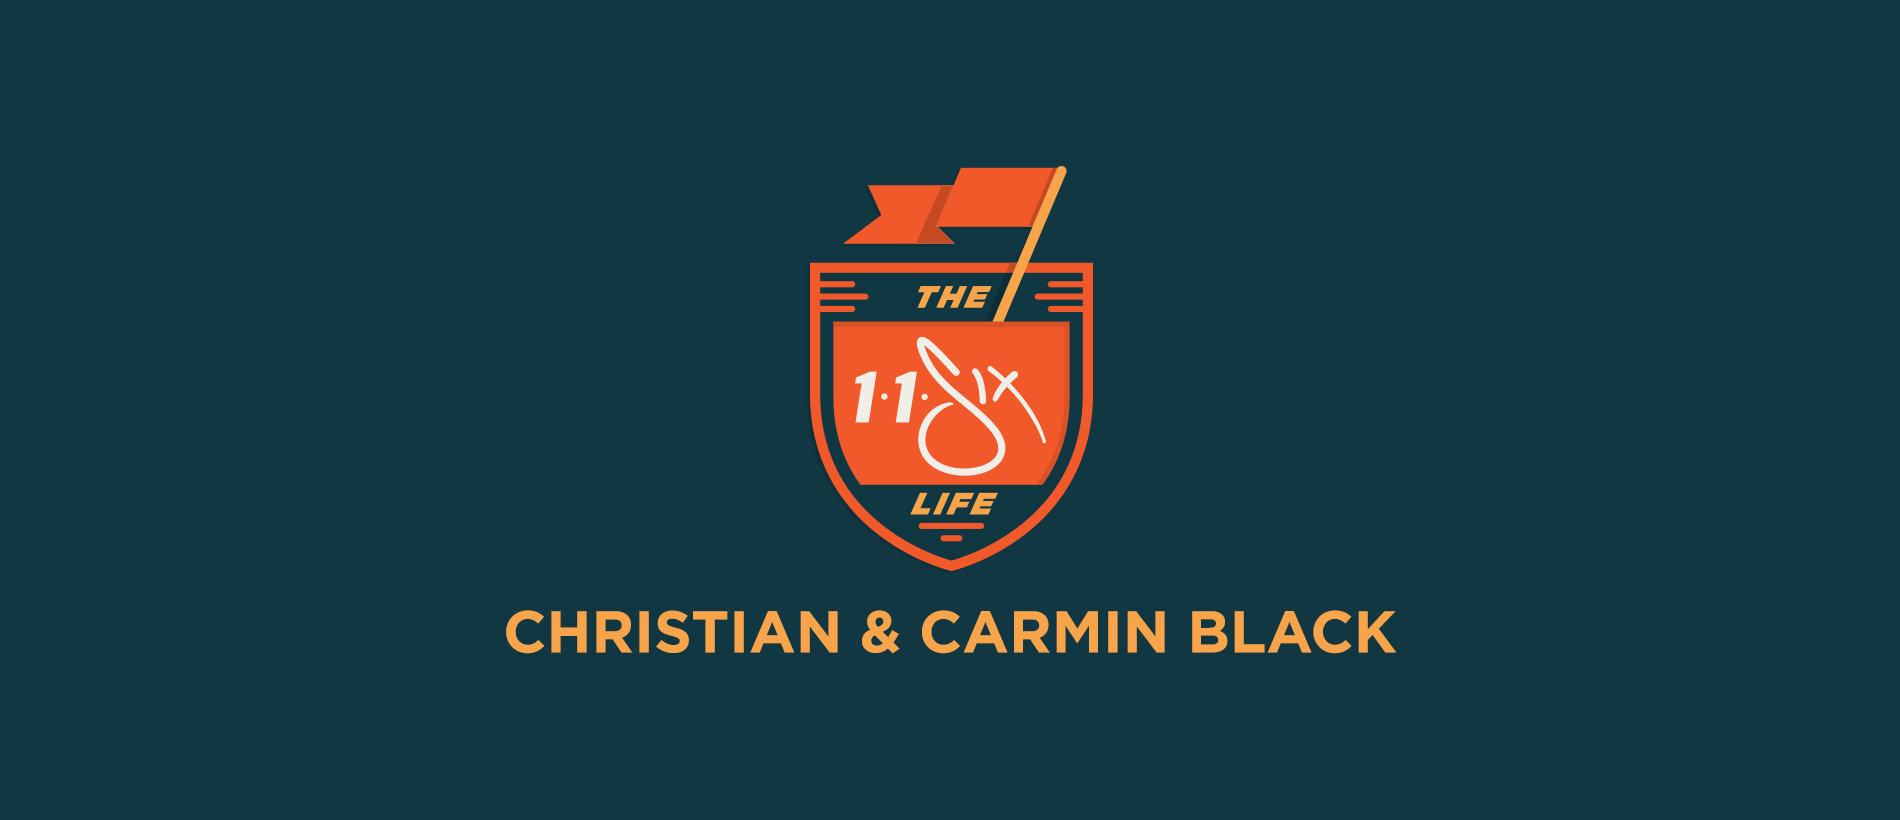 The 116 Life x Christian & Carmin Black